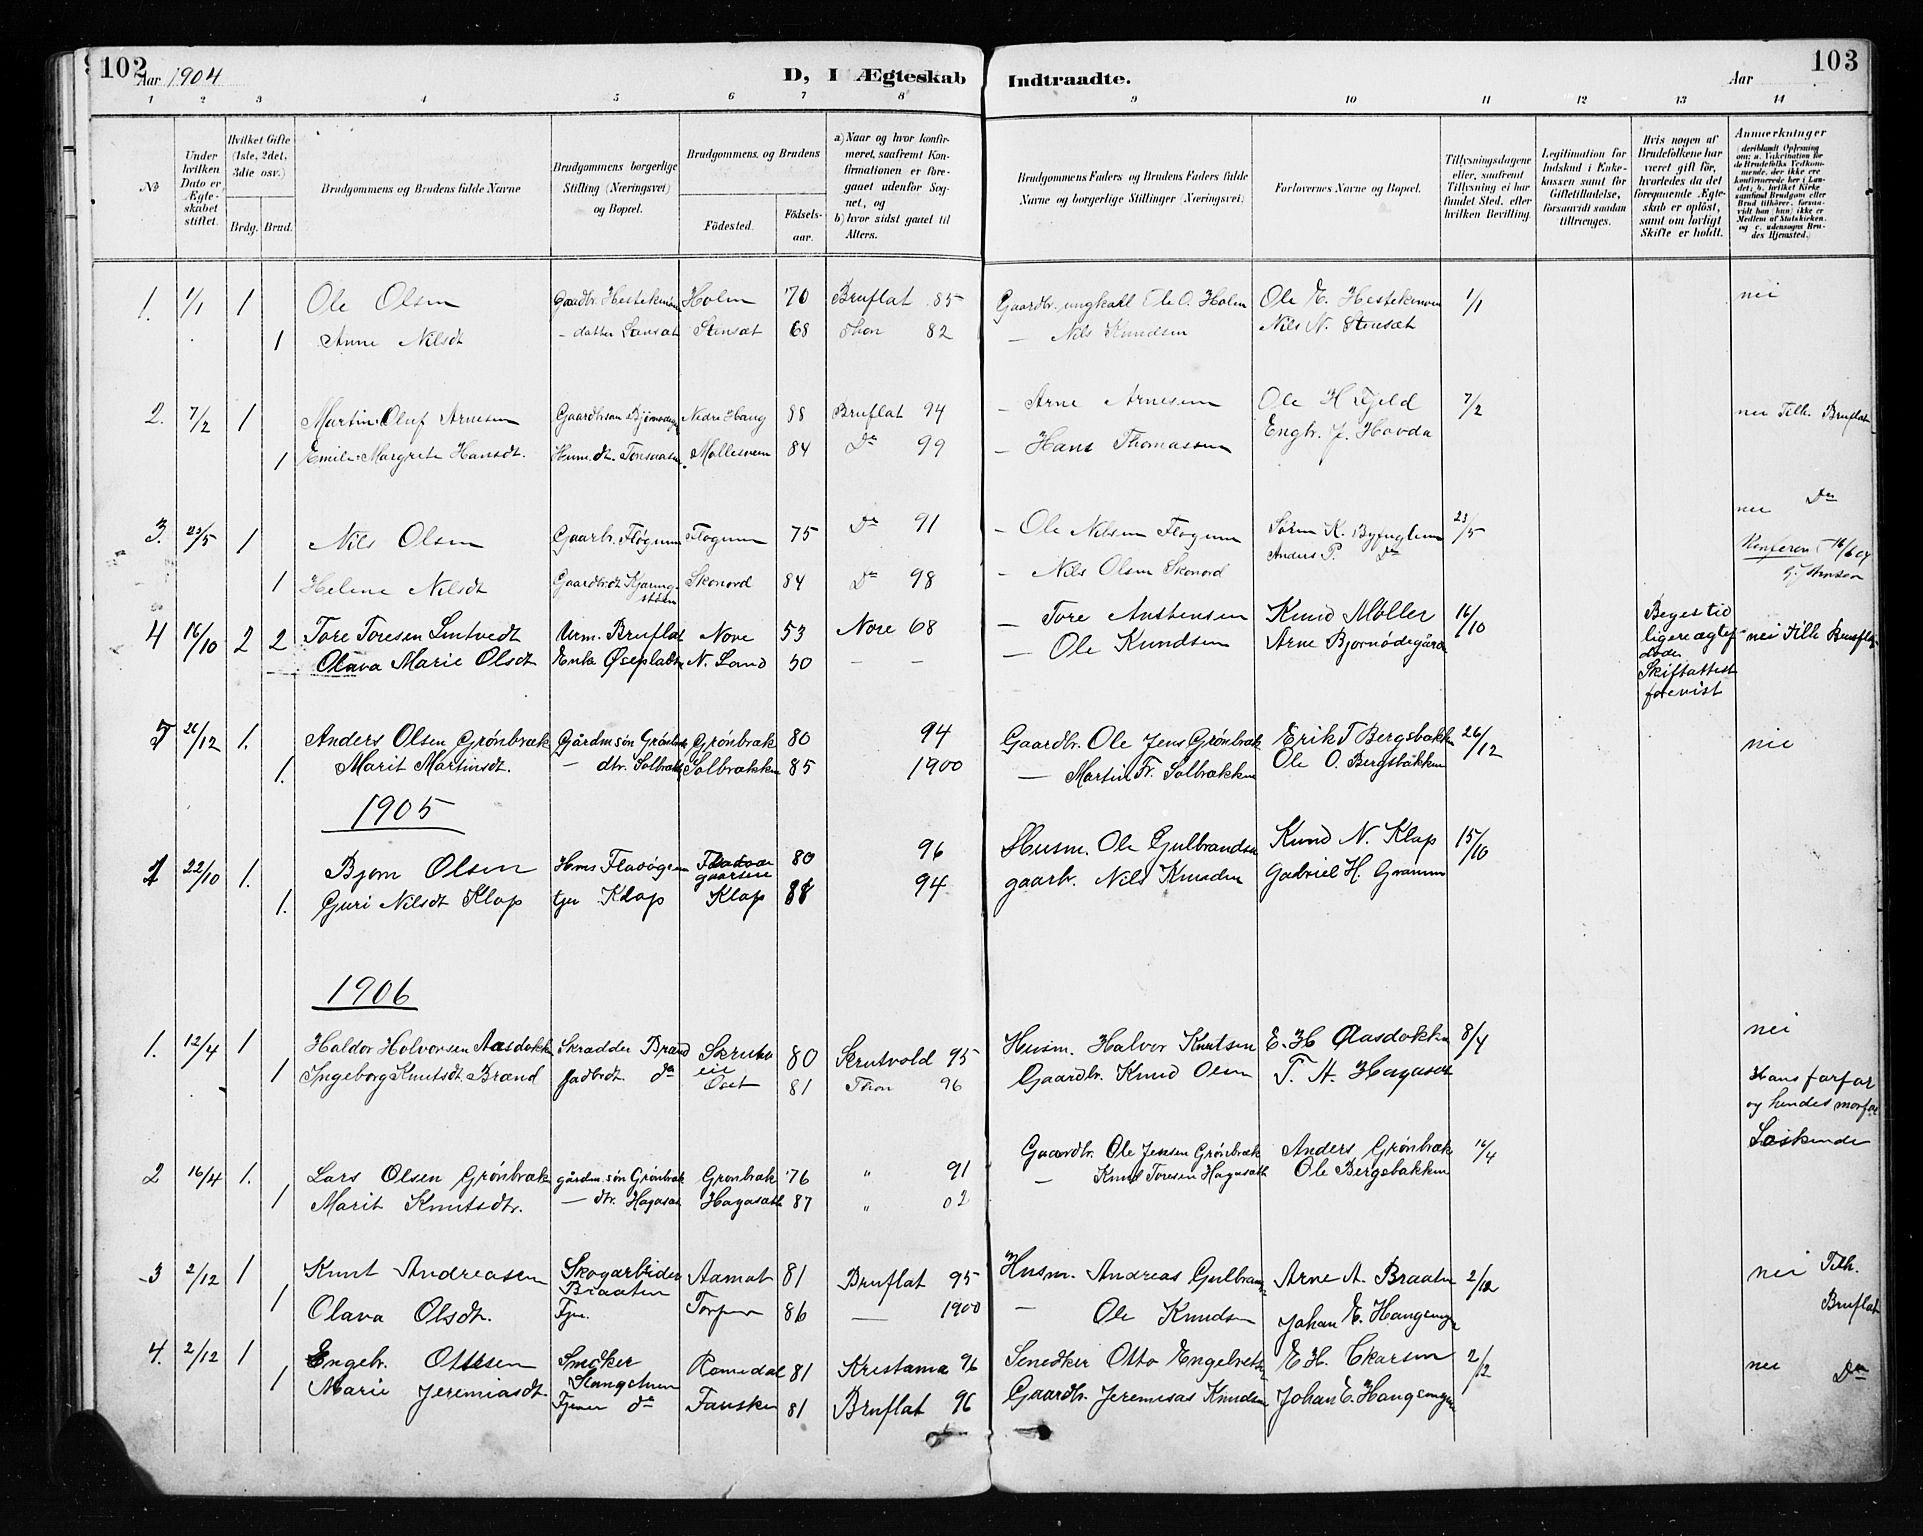 SAH, Etnedal prestekontor, H/Ha/Hab/Habb/L0001: Klokkerbok nr. II 1, 1894-1911, s. 102-103